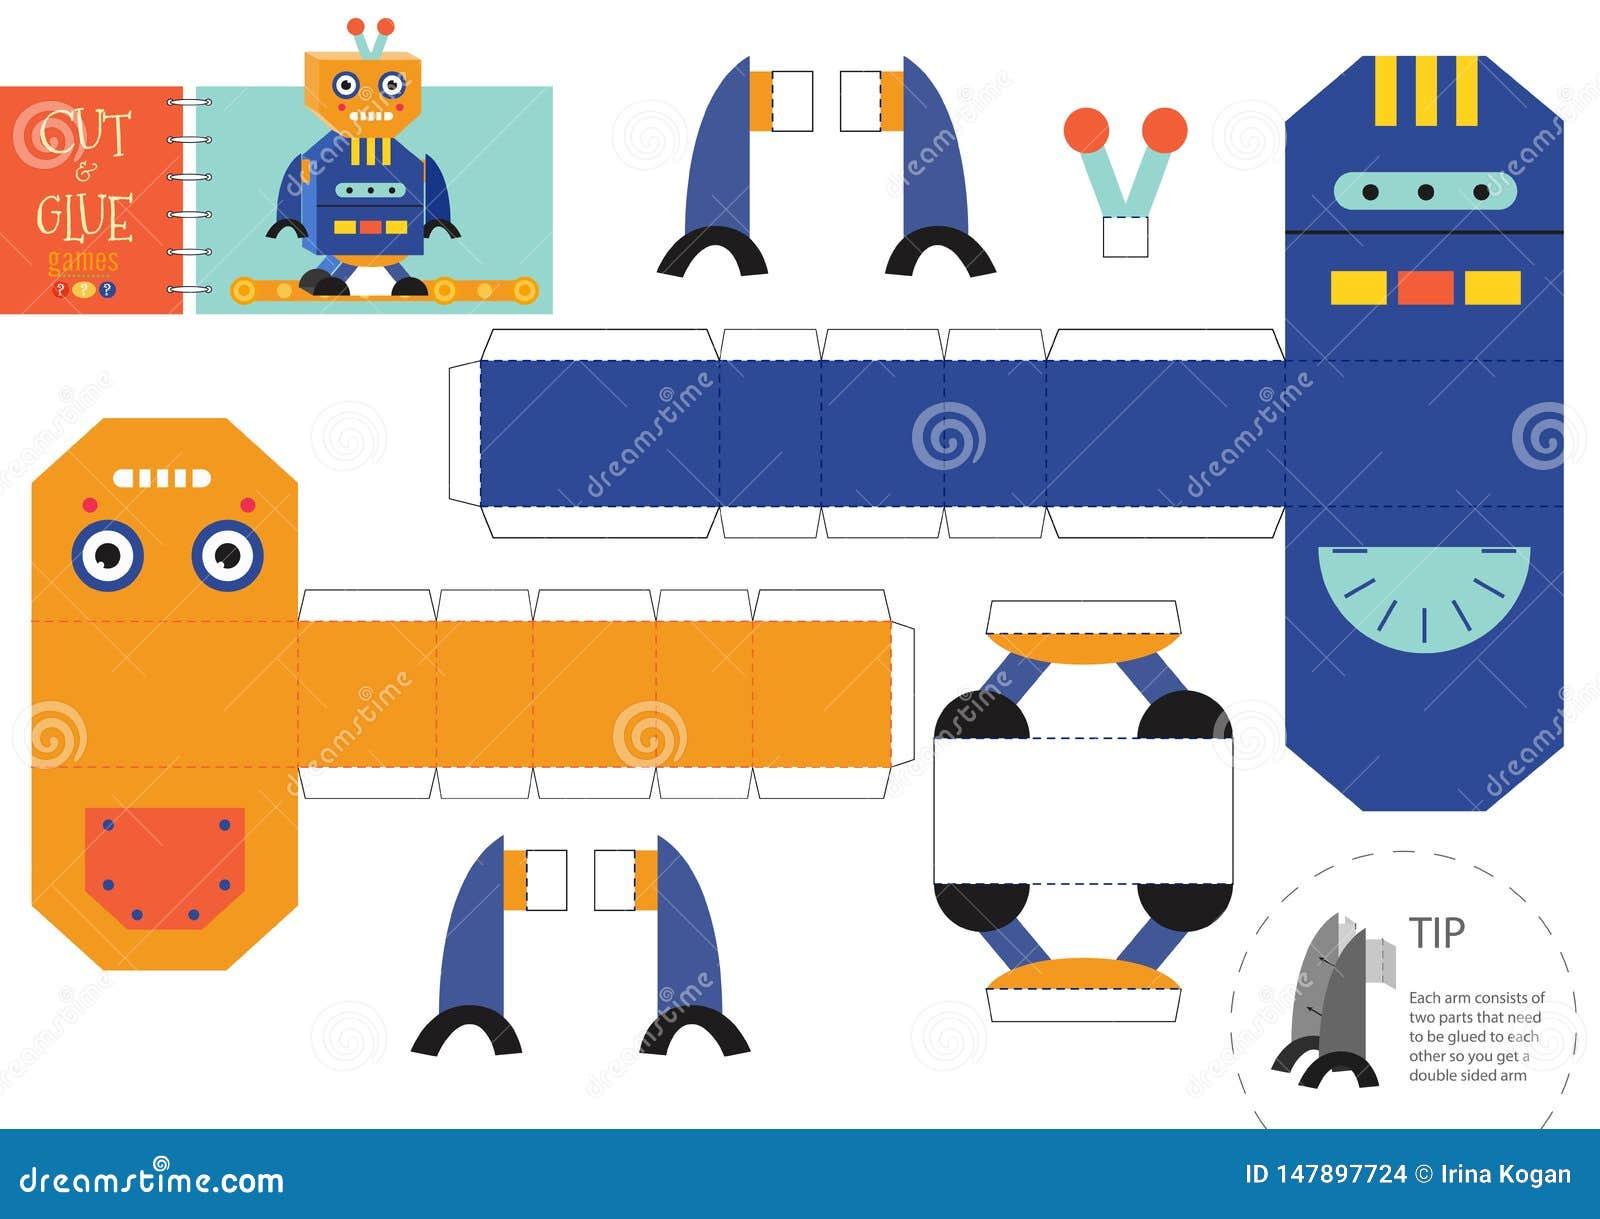 Cut And Glue Robot Toy Vector Illustration, Worksheet  Paper